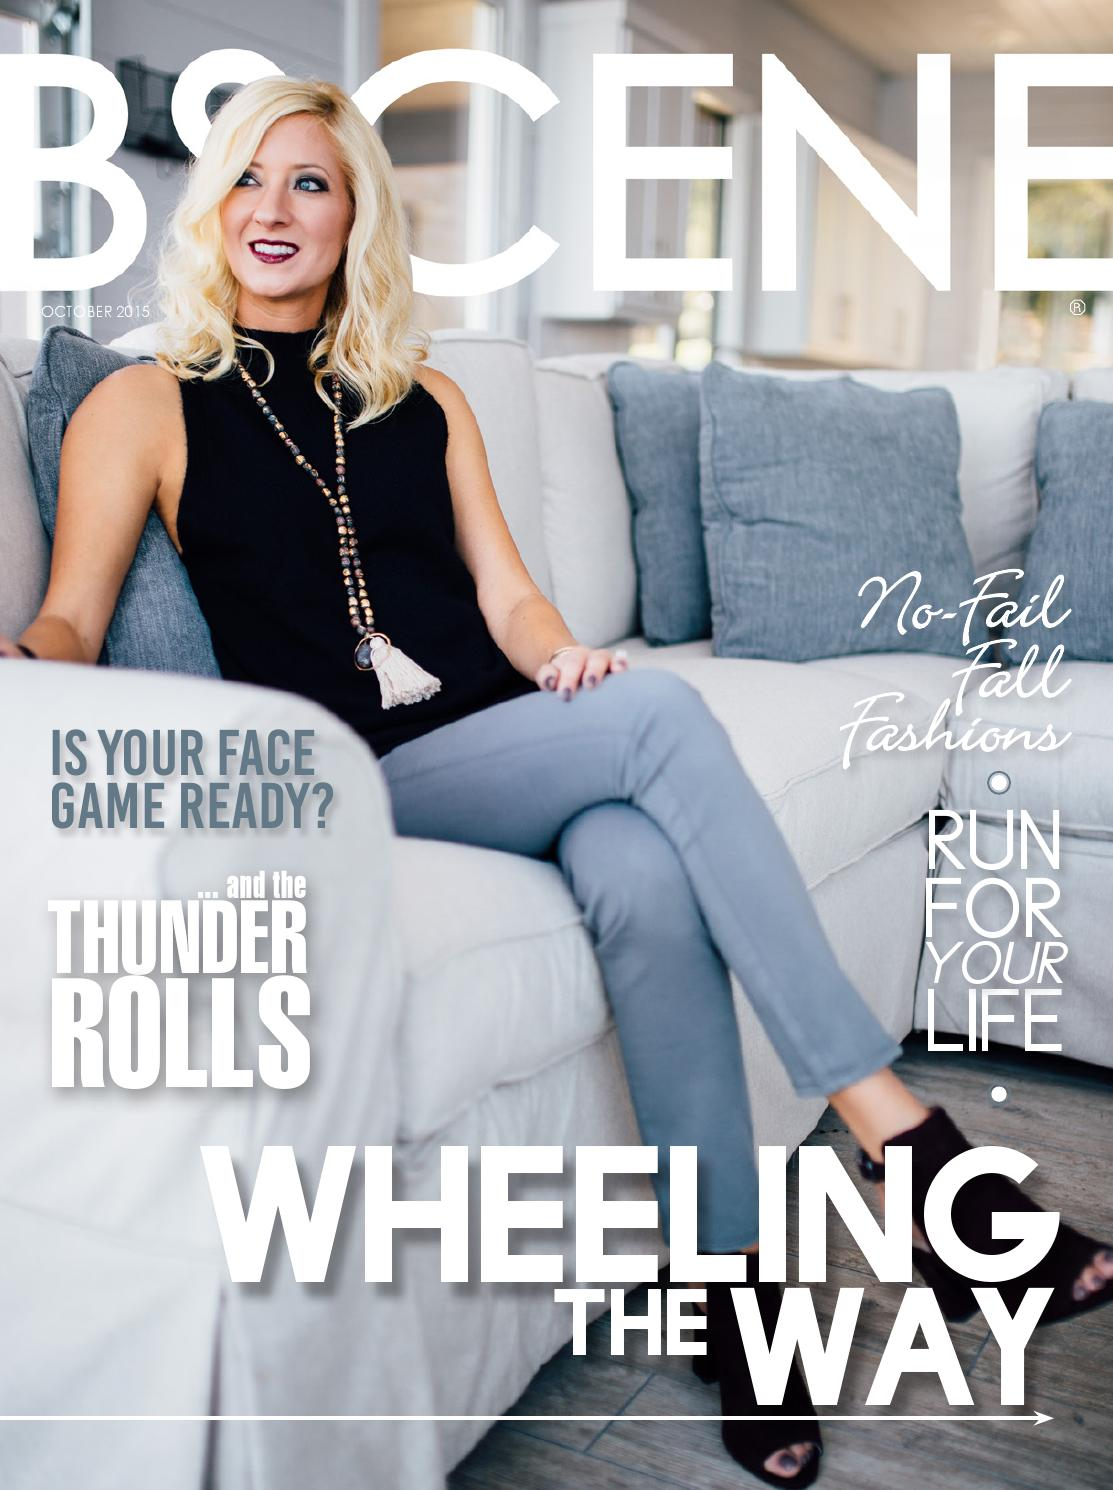 Bscene magazine october 2015 by bscene magazine issuu for Jack ryan fine jewelry austin